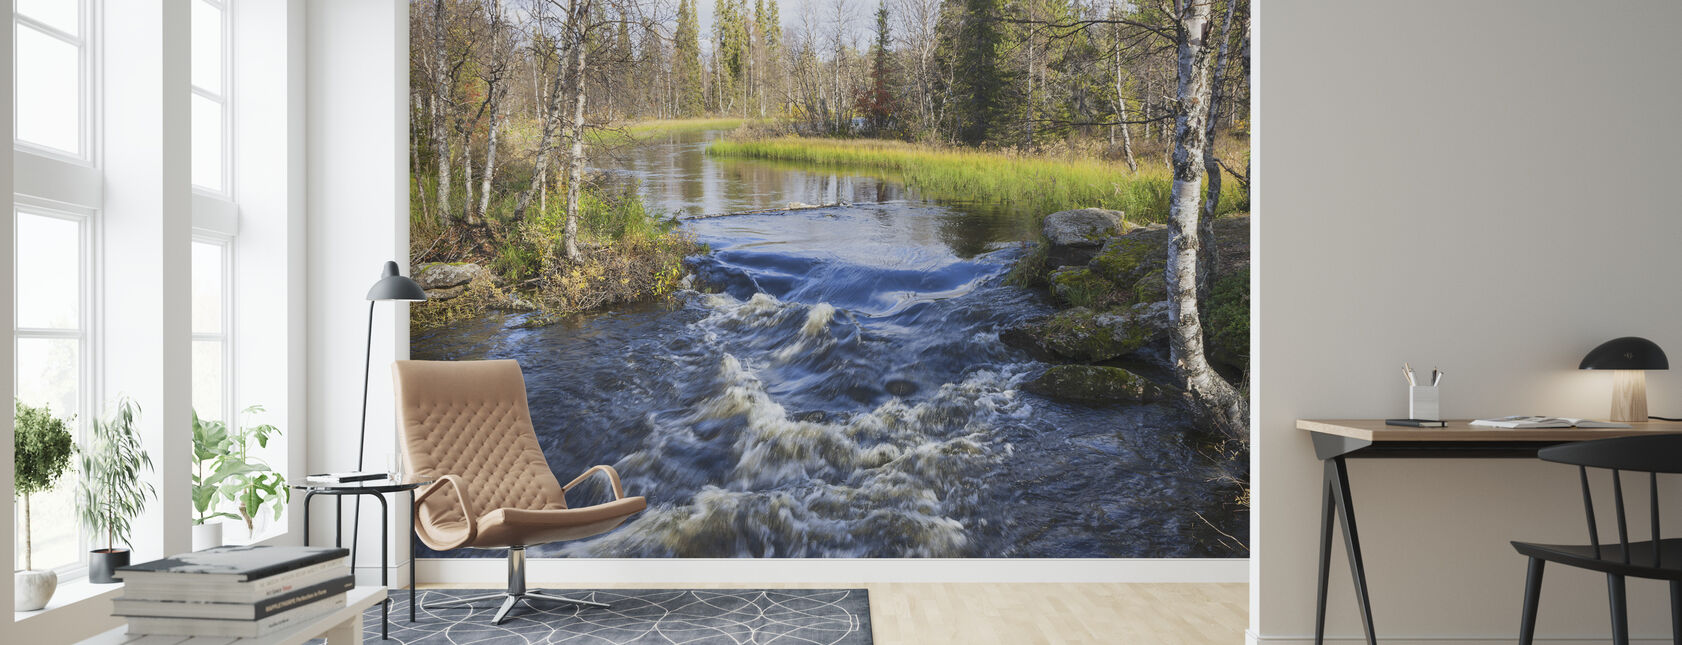 Lappland River - Tapet - Stue